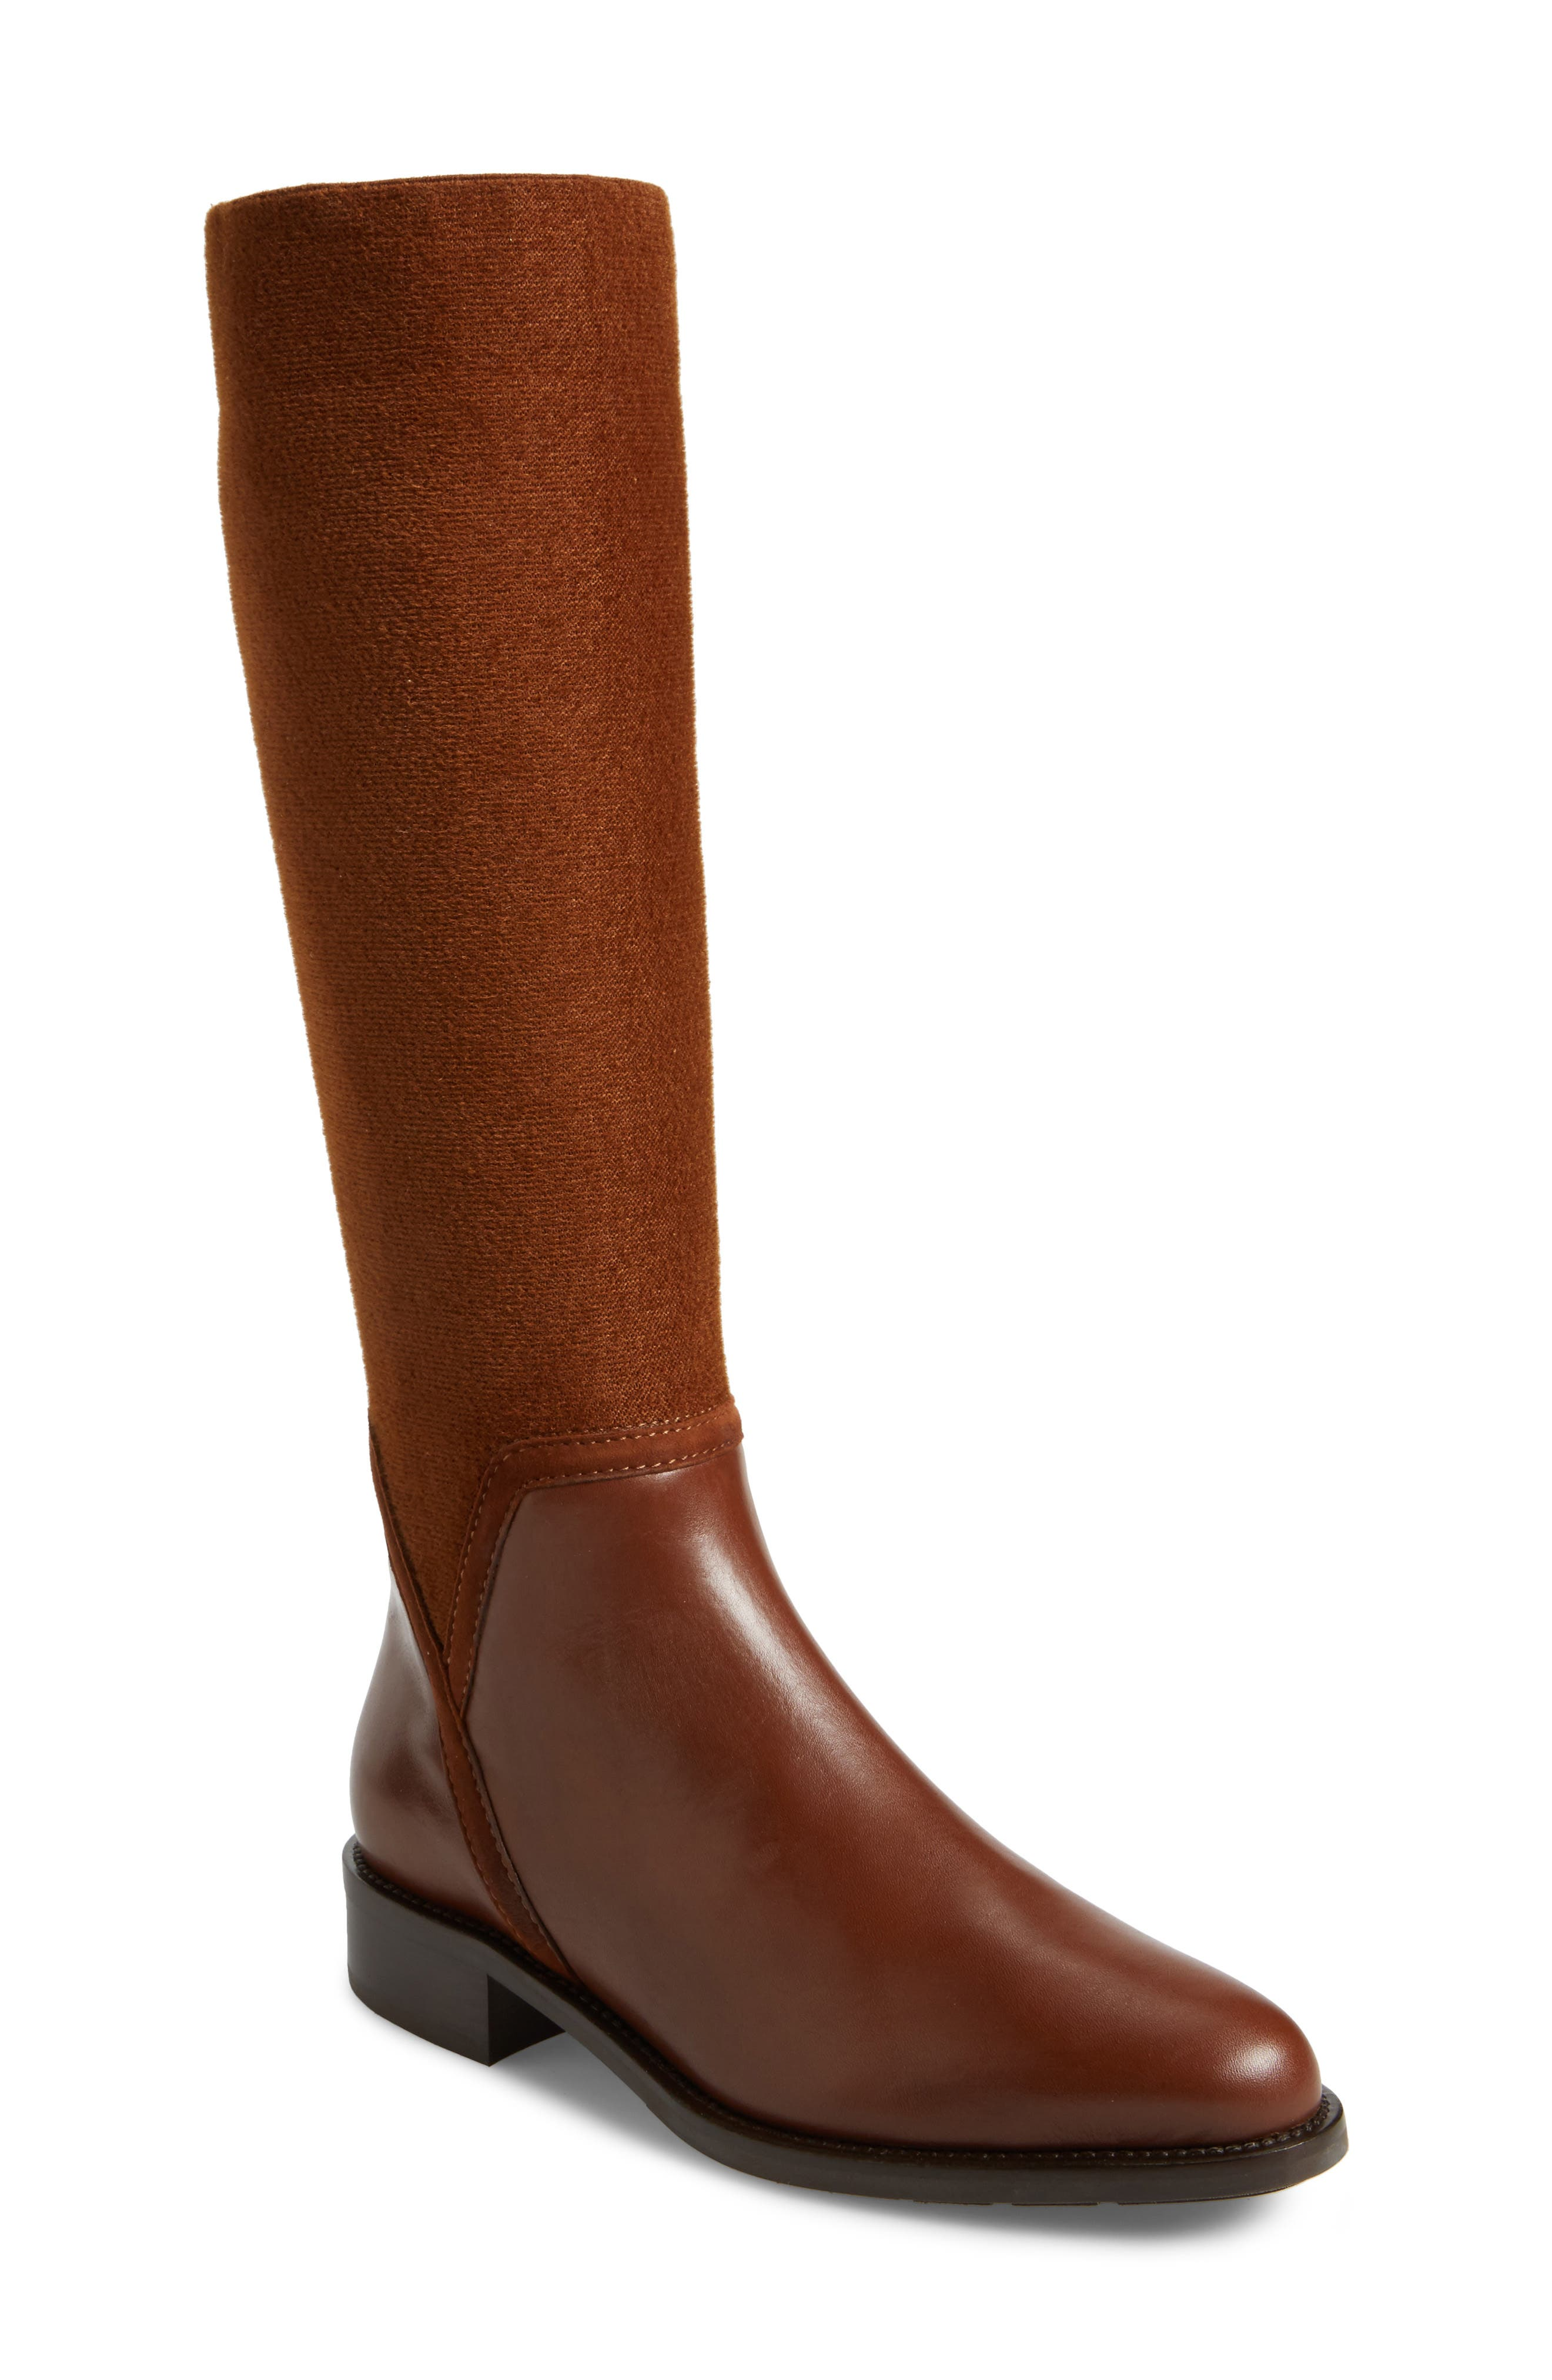 Alternate Image 1 Selected - Aquatalia Nicolette Weatherproof Knee High Boot (Women)